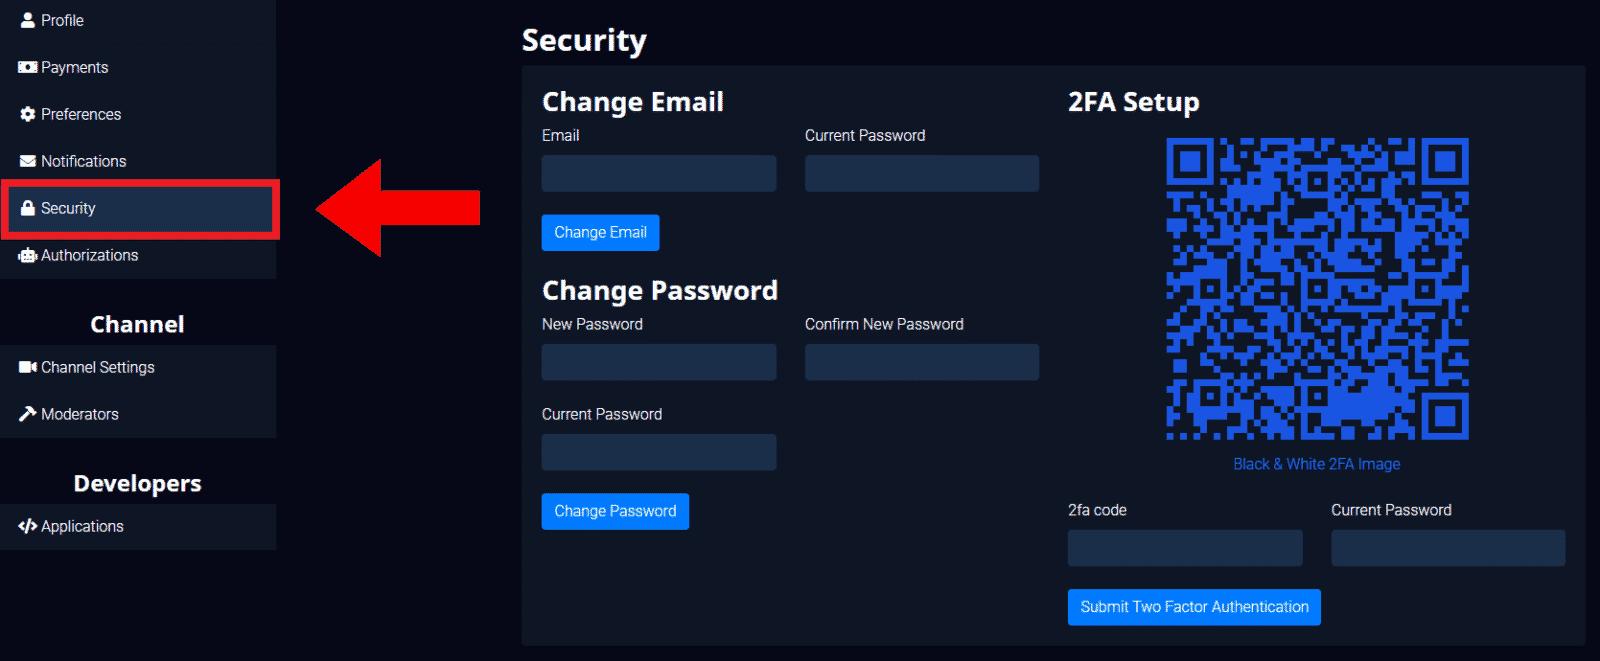 glimesh security